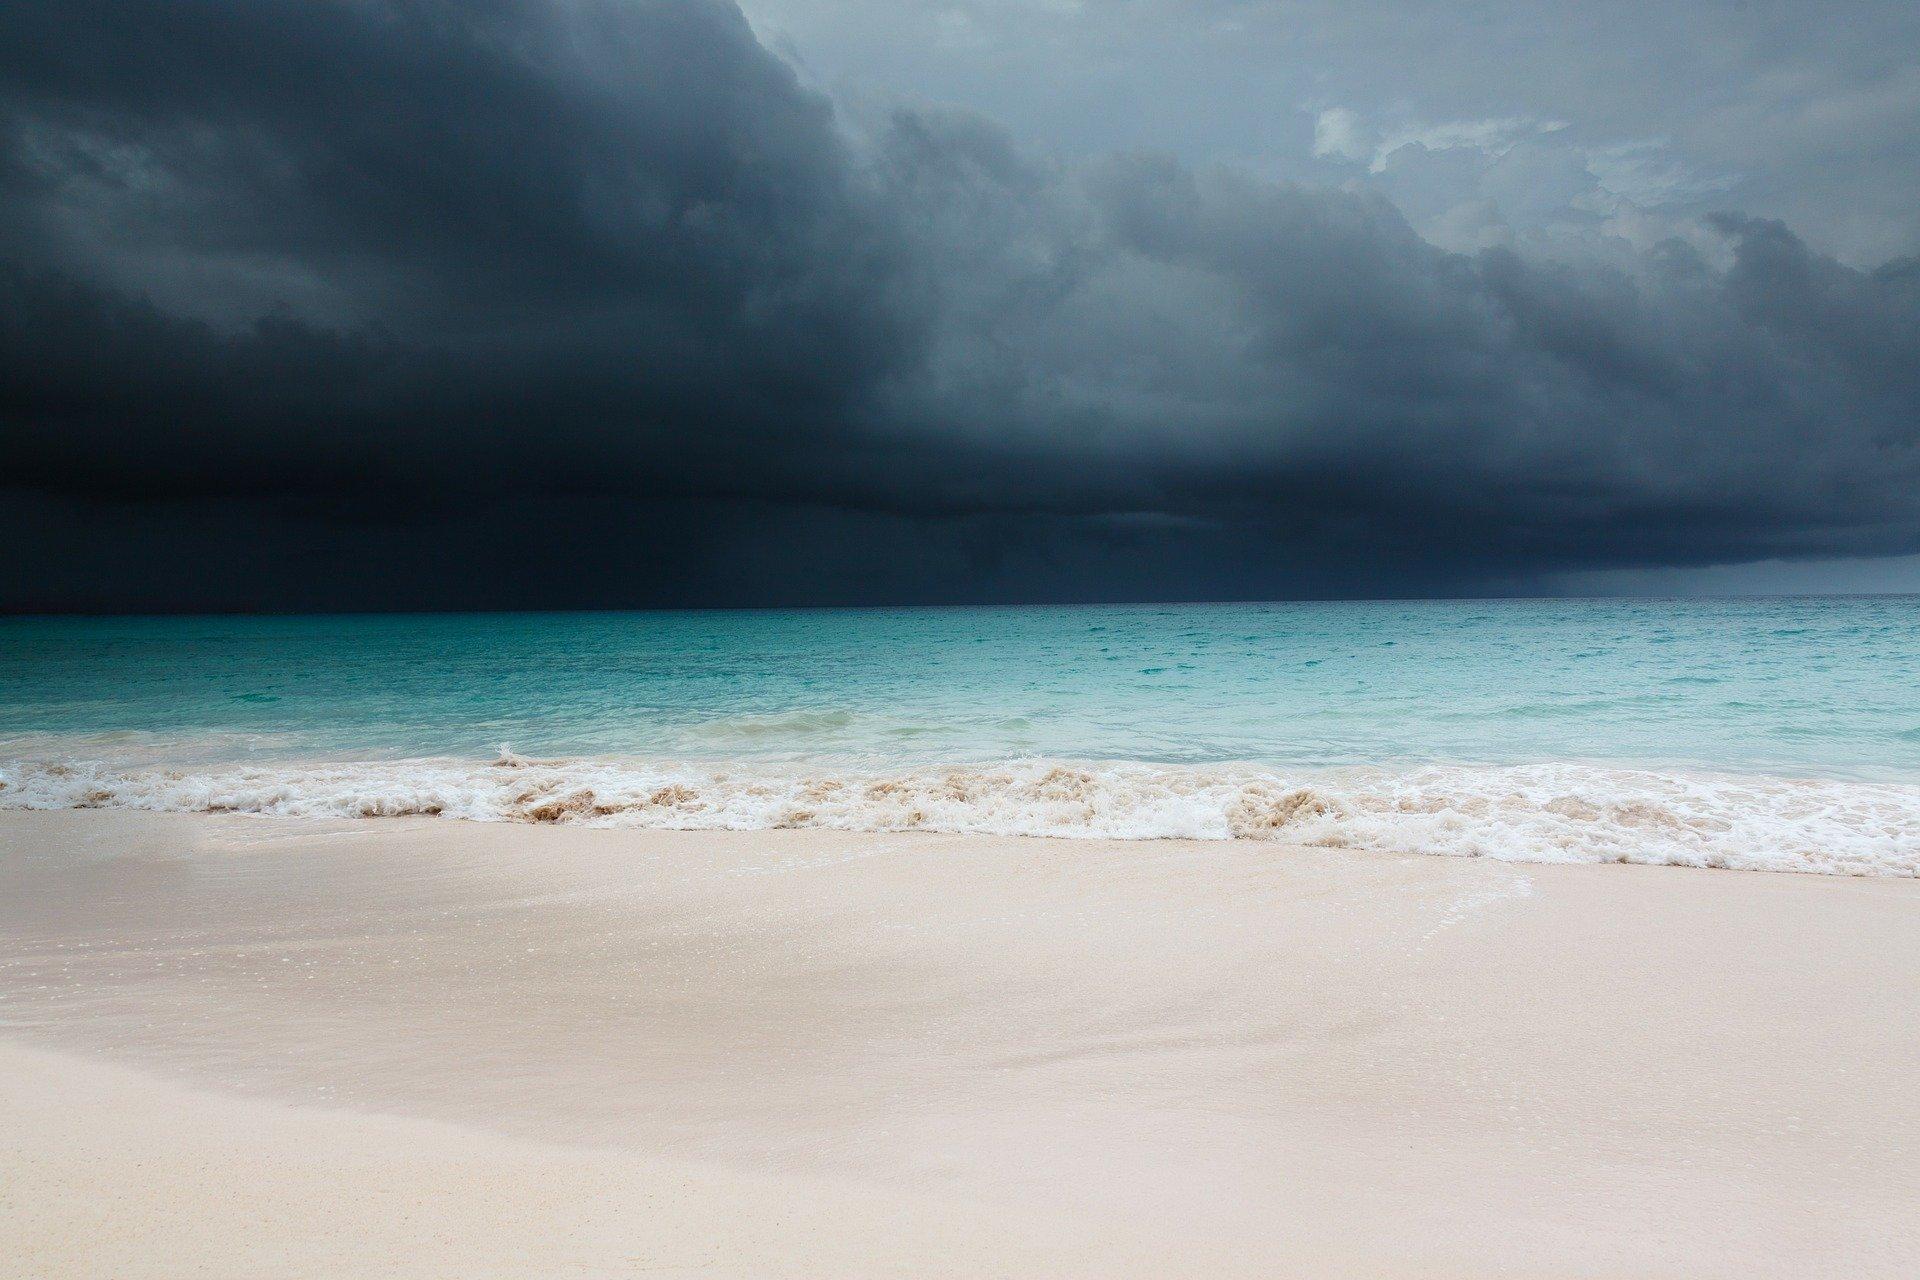 Storm on horizon at beach